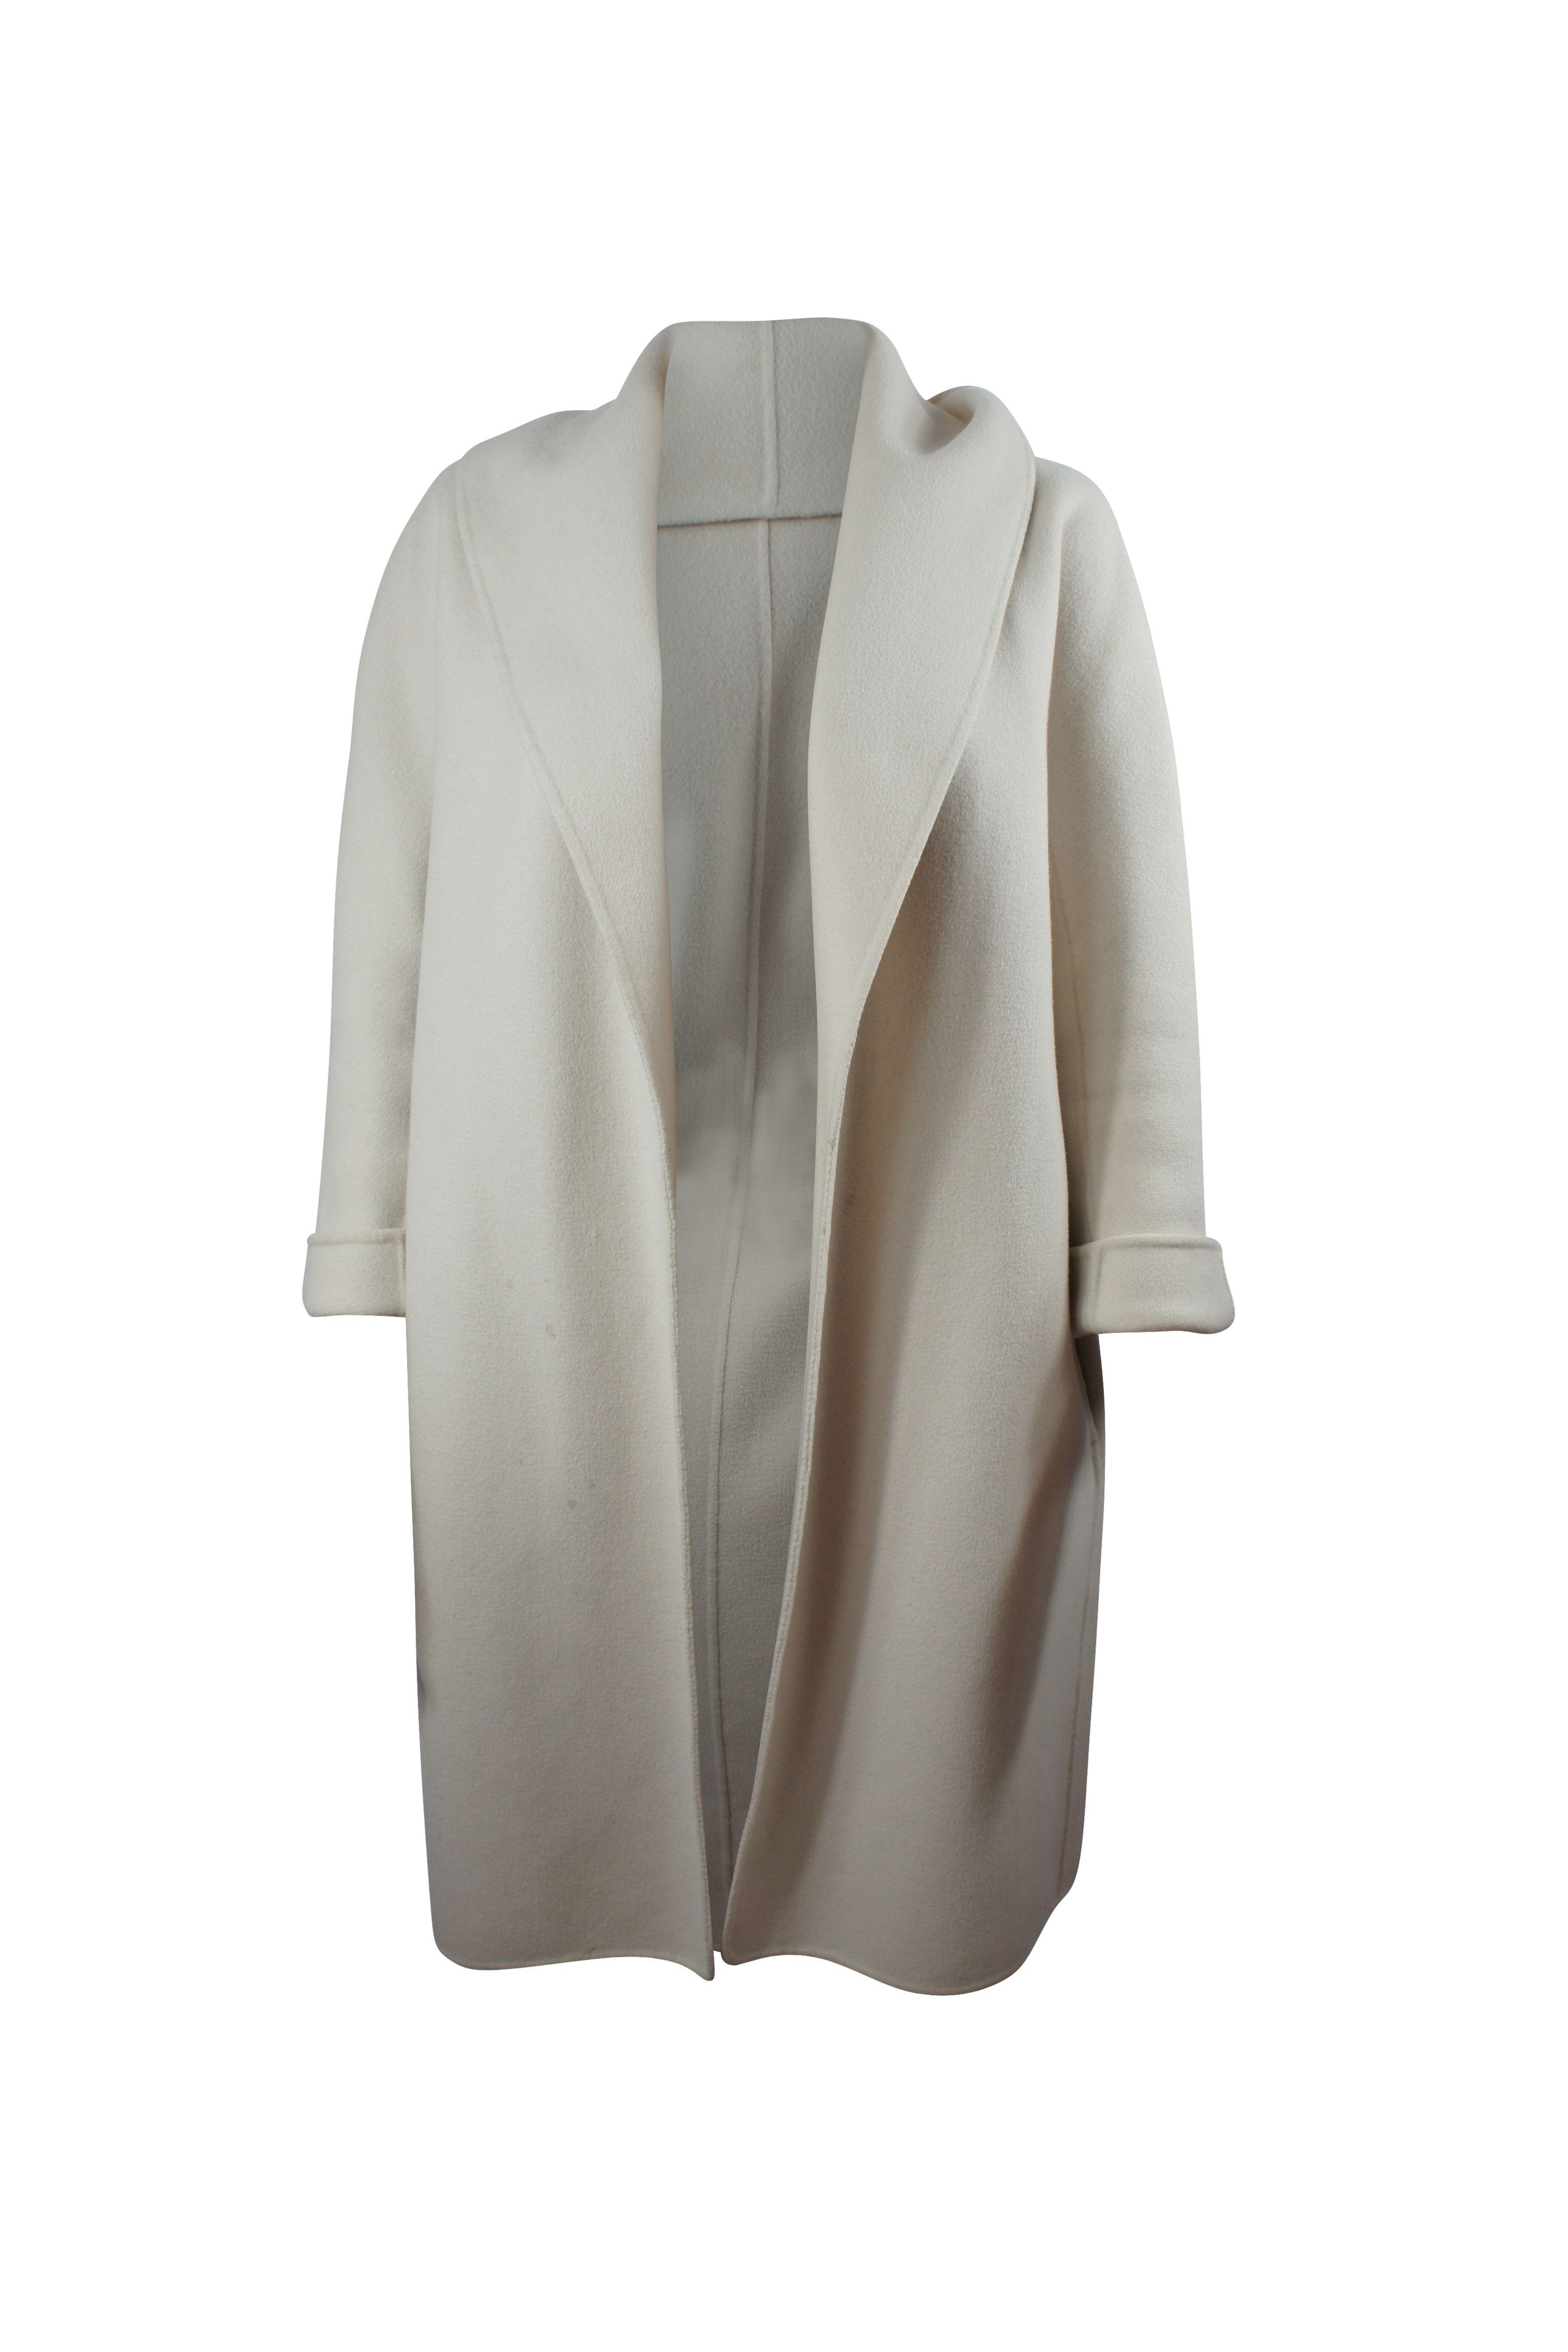 Max Mara Cream Coat 3 Preview Images